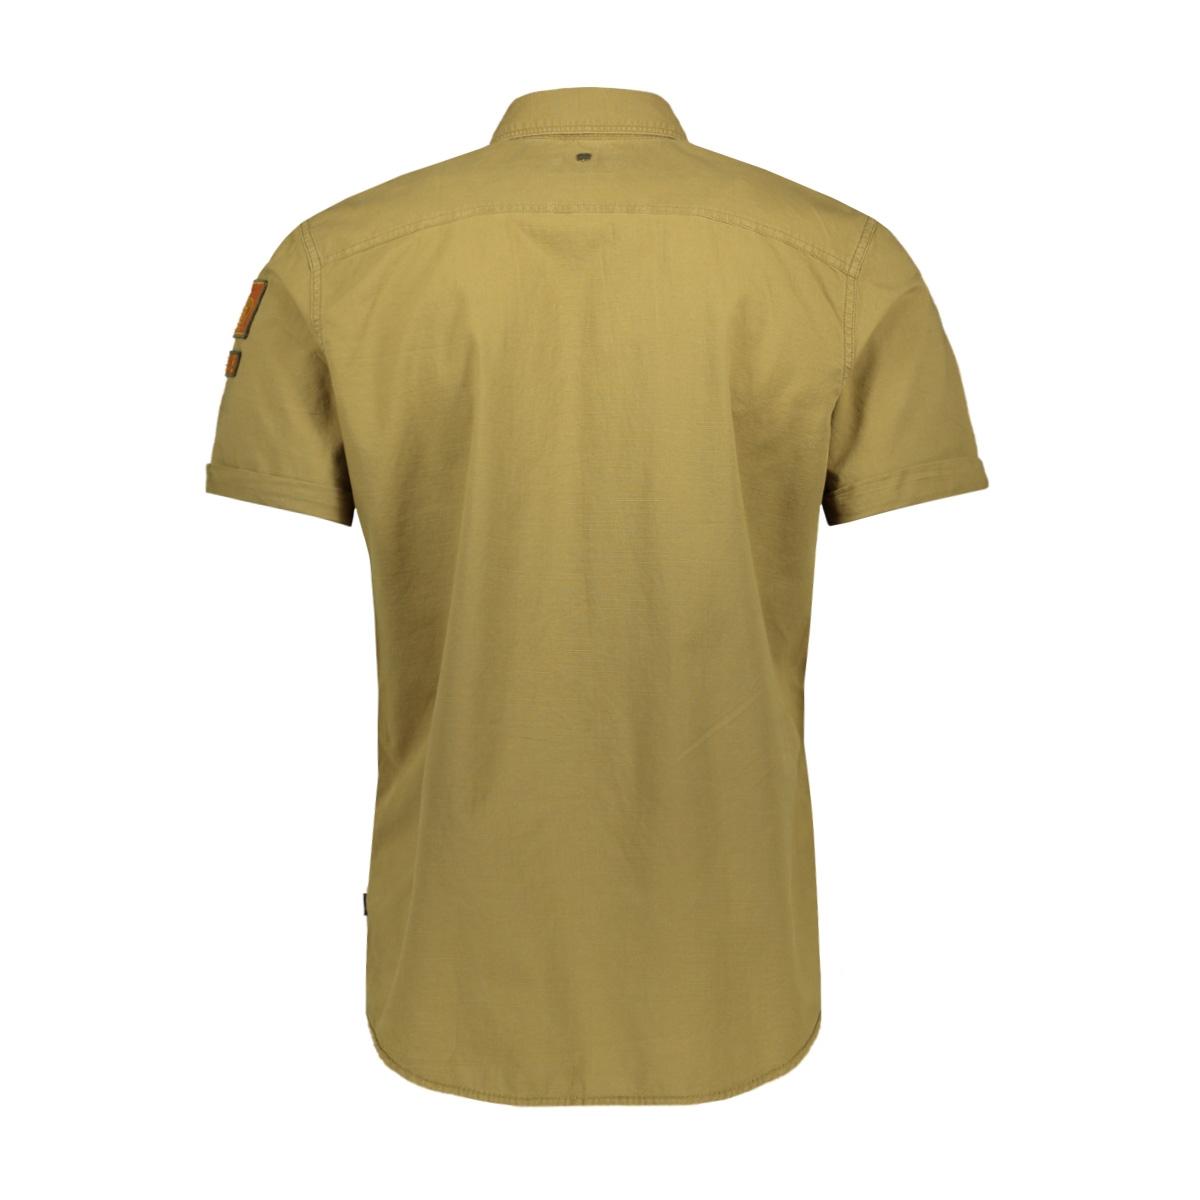 cotton cargo psis202263 pme legend overhemd 6408